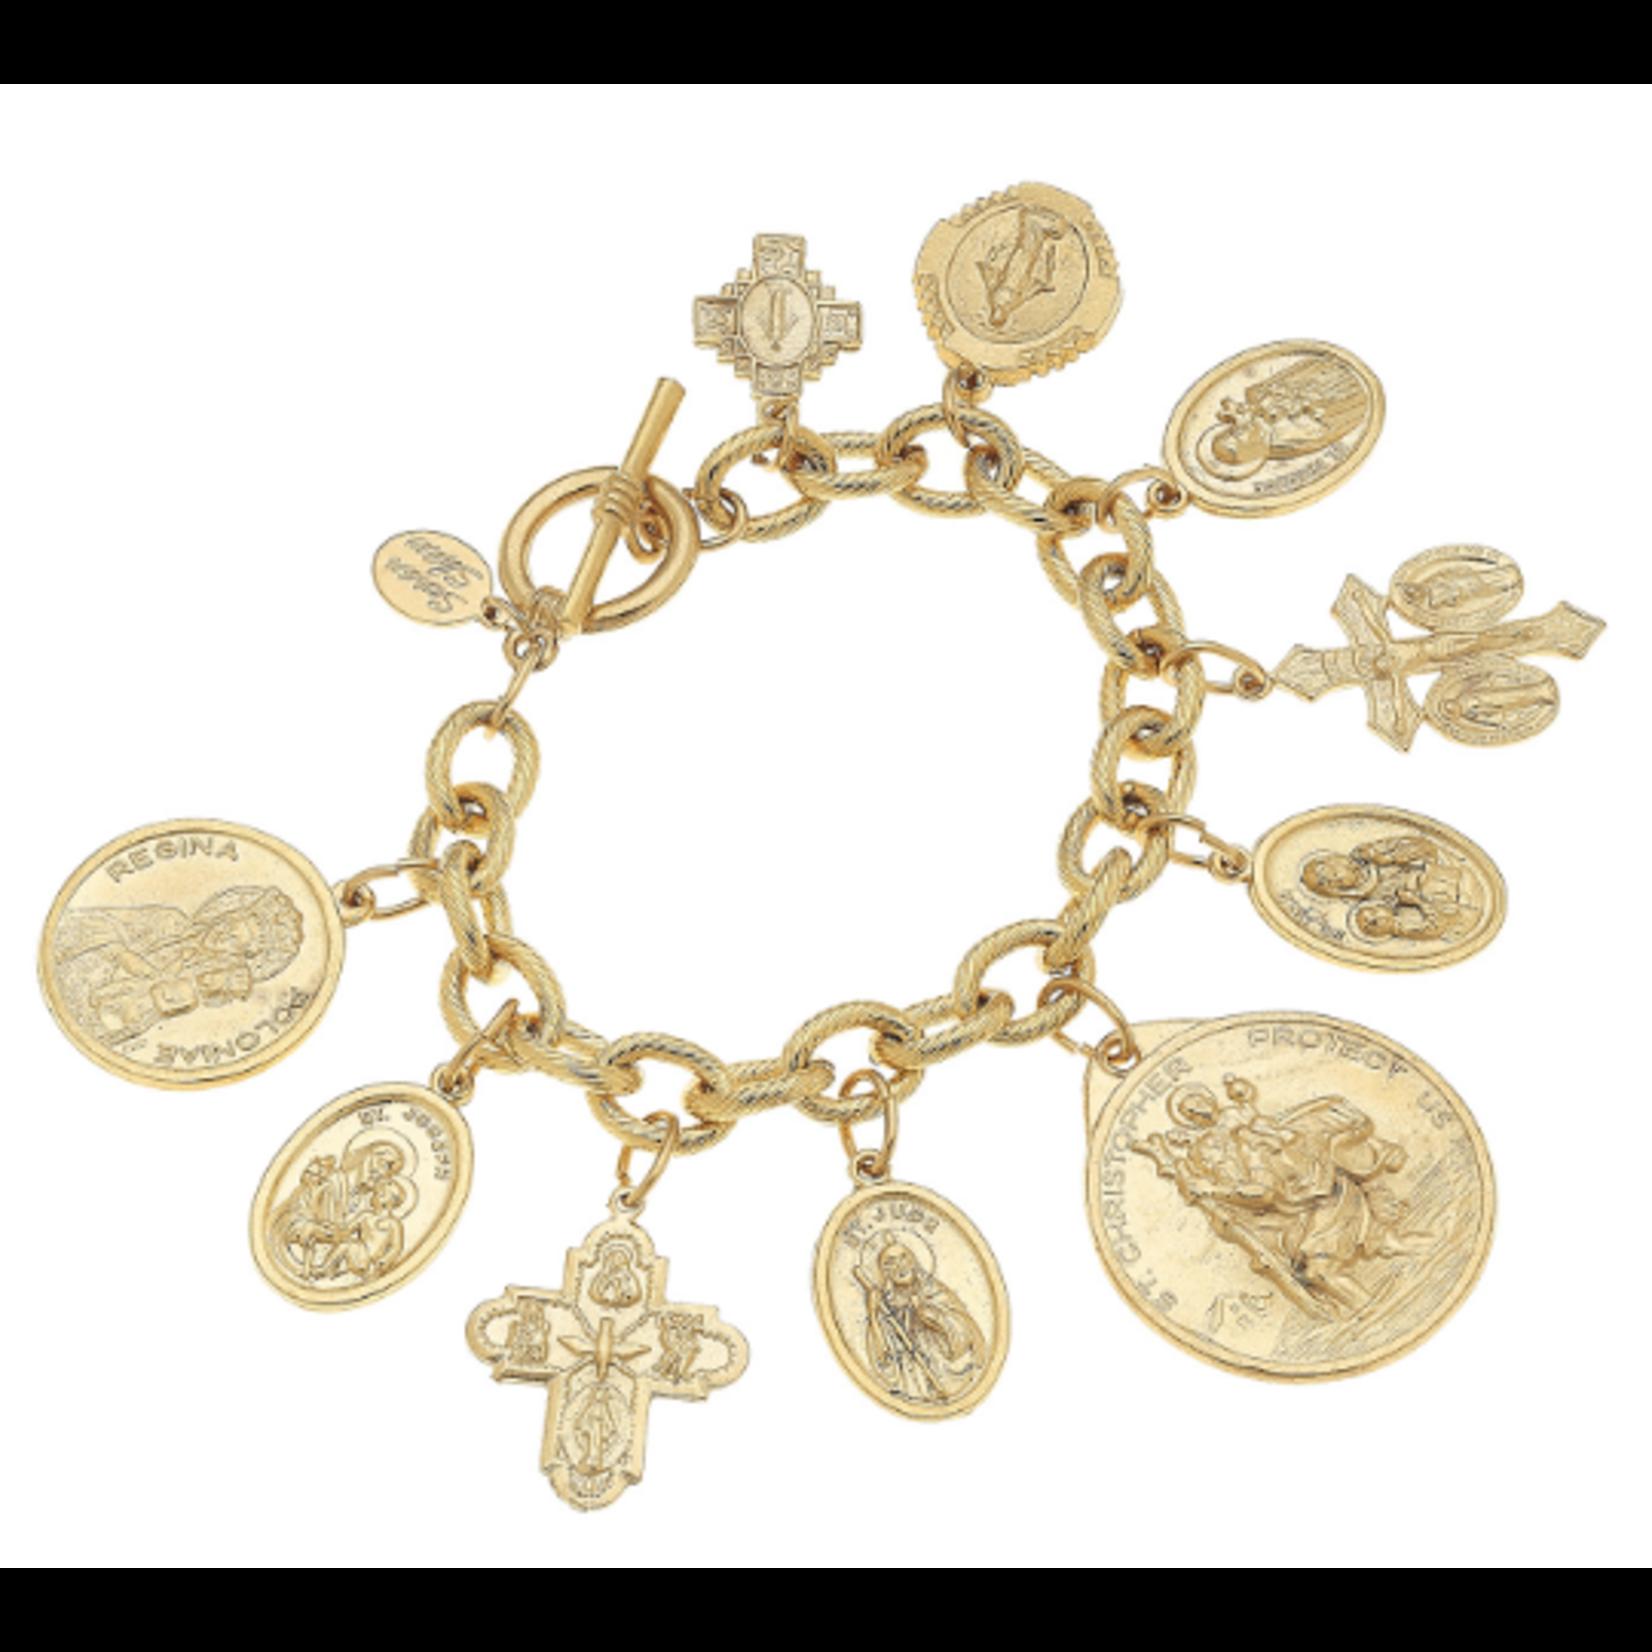 Susan Shaw Susan Shaw Gold Saints Charm Bracelet